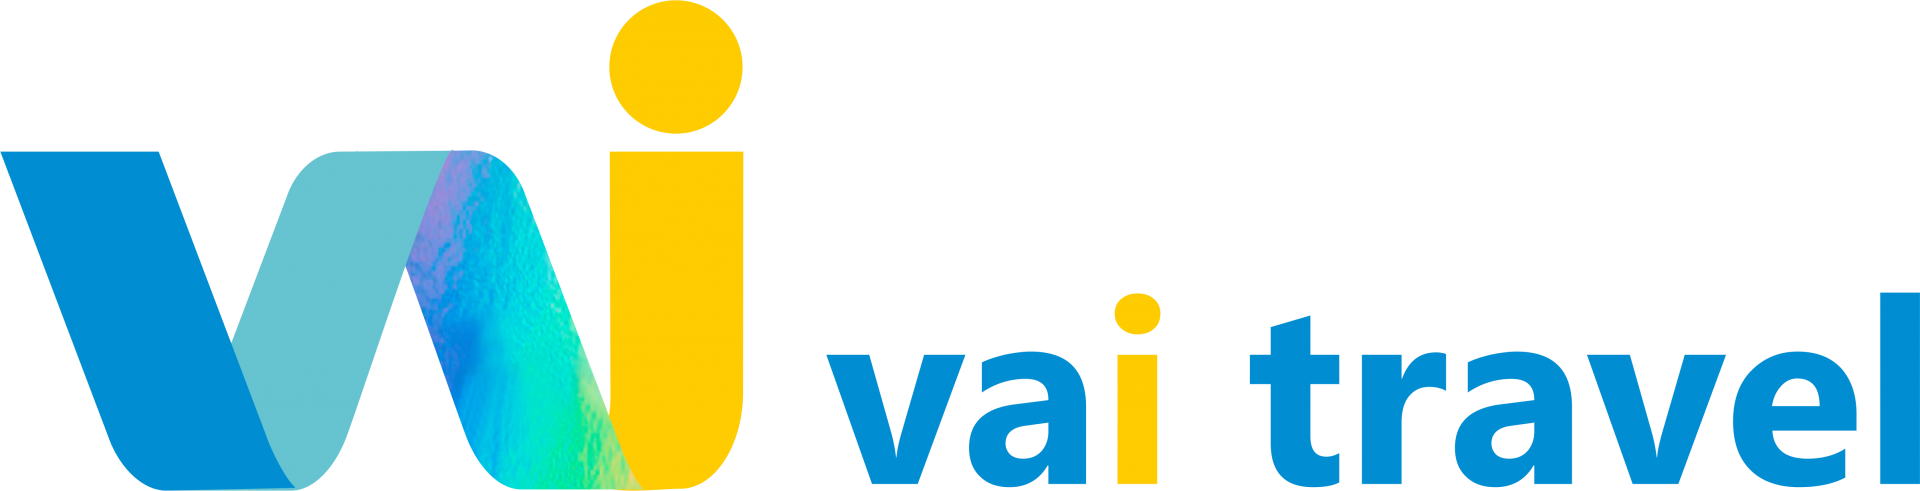 Vai Travel